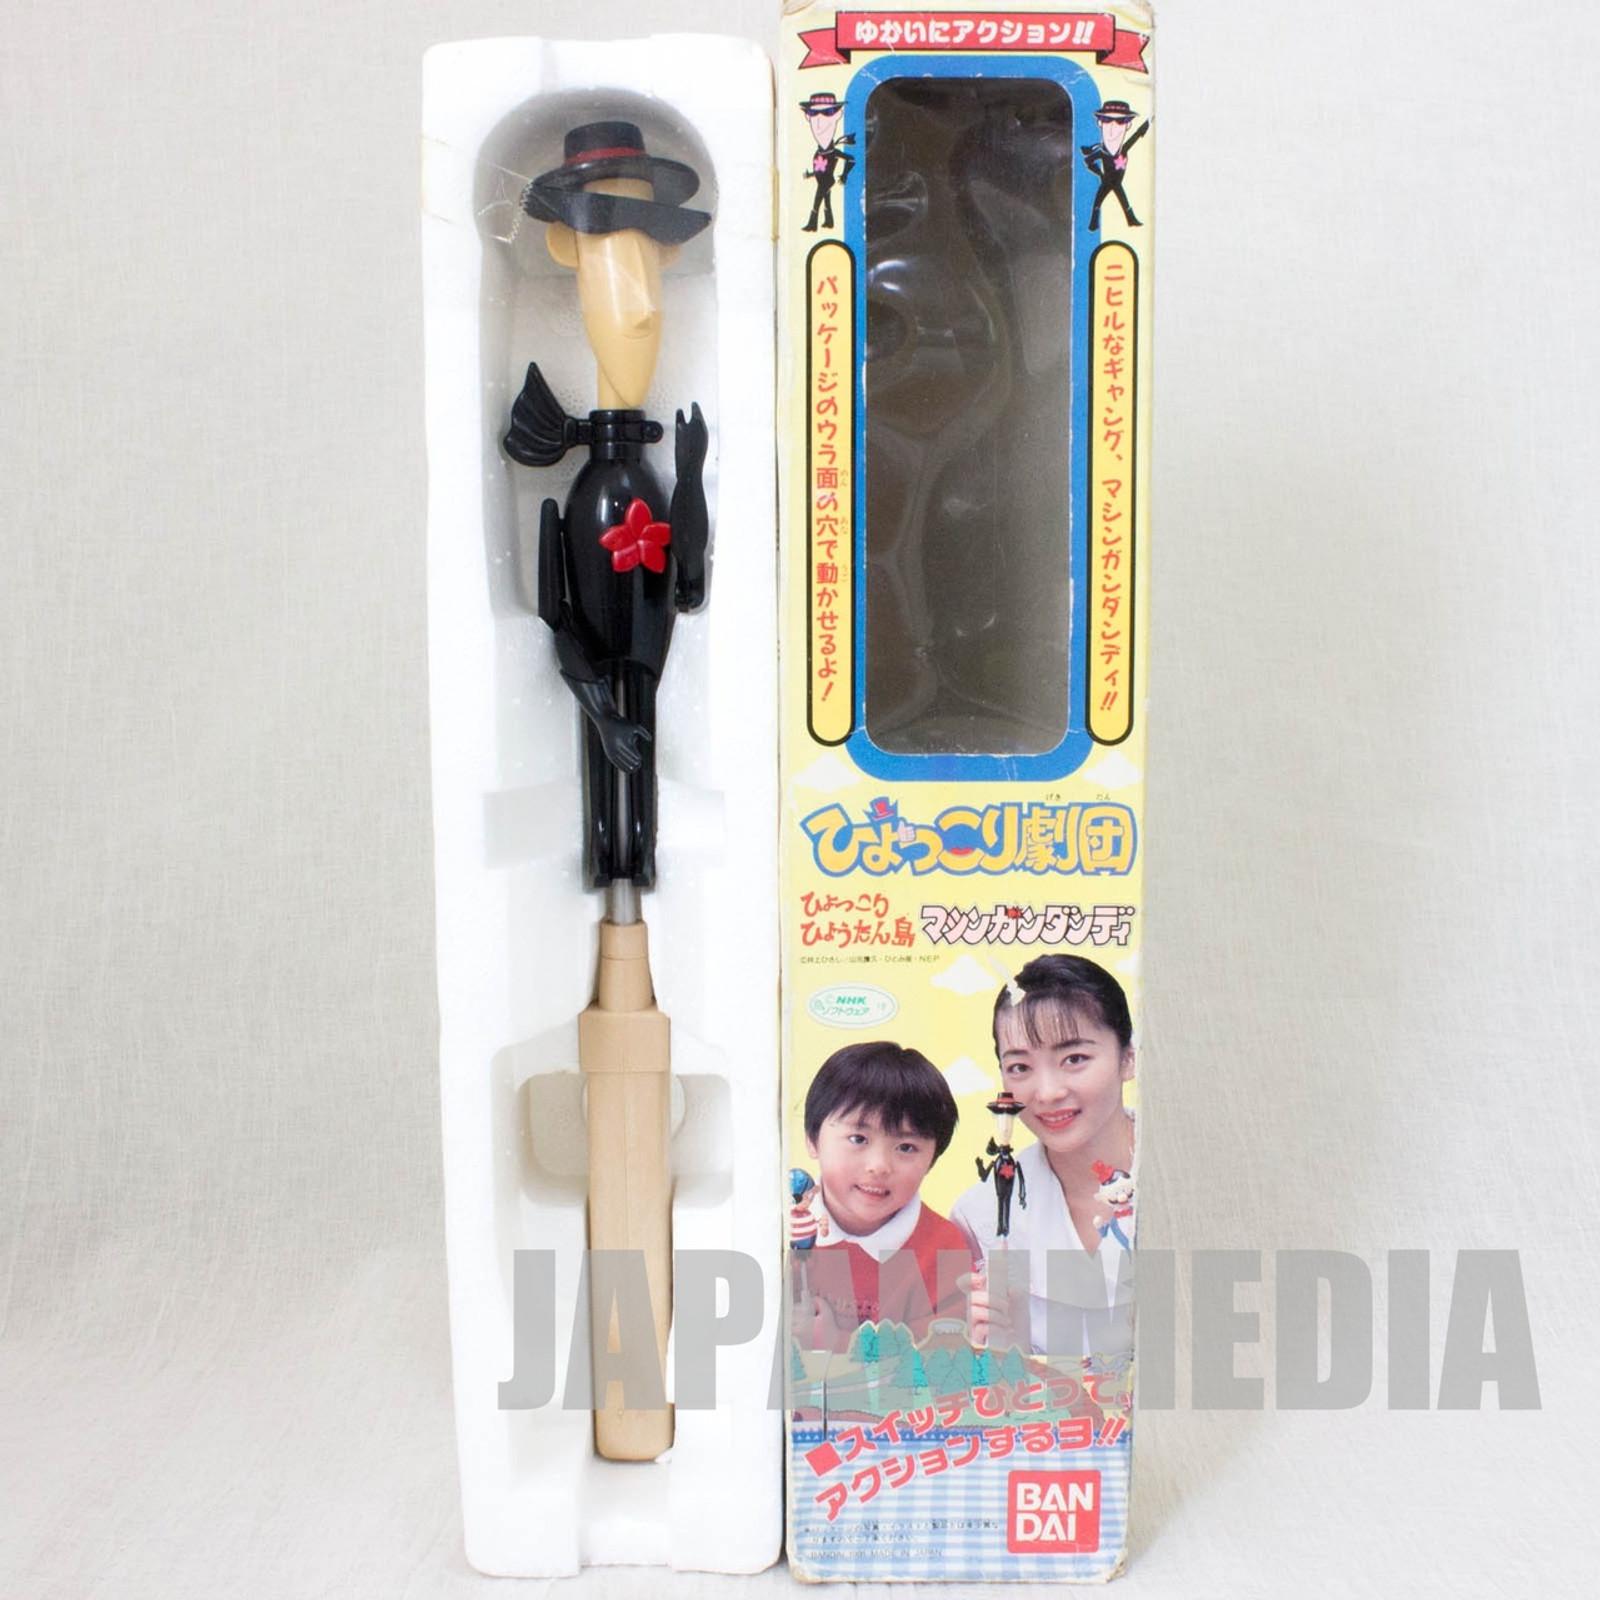 RARE! Hyokkori Hyotanjima Machine Gun Dandy Action Figure Puppet BANDAI JAPAN